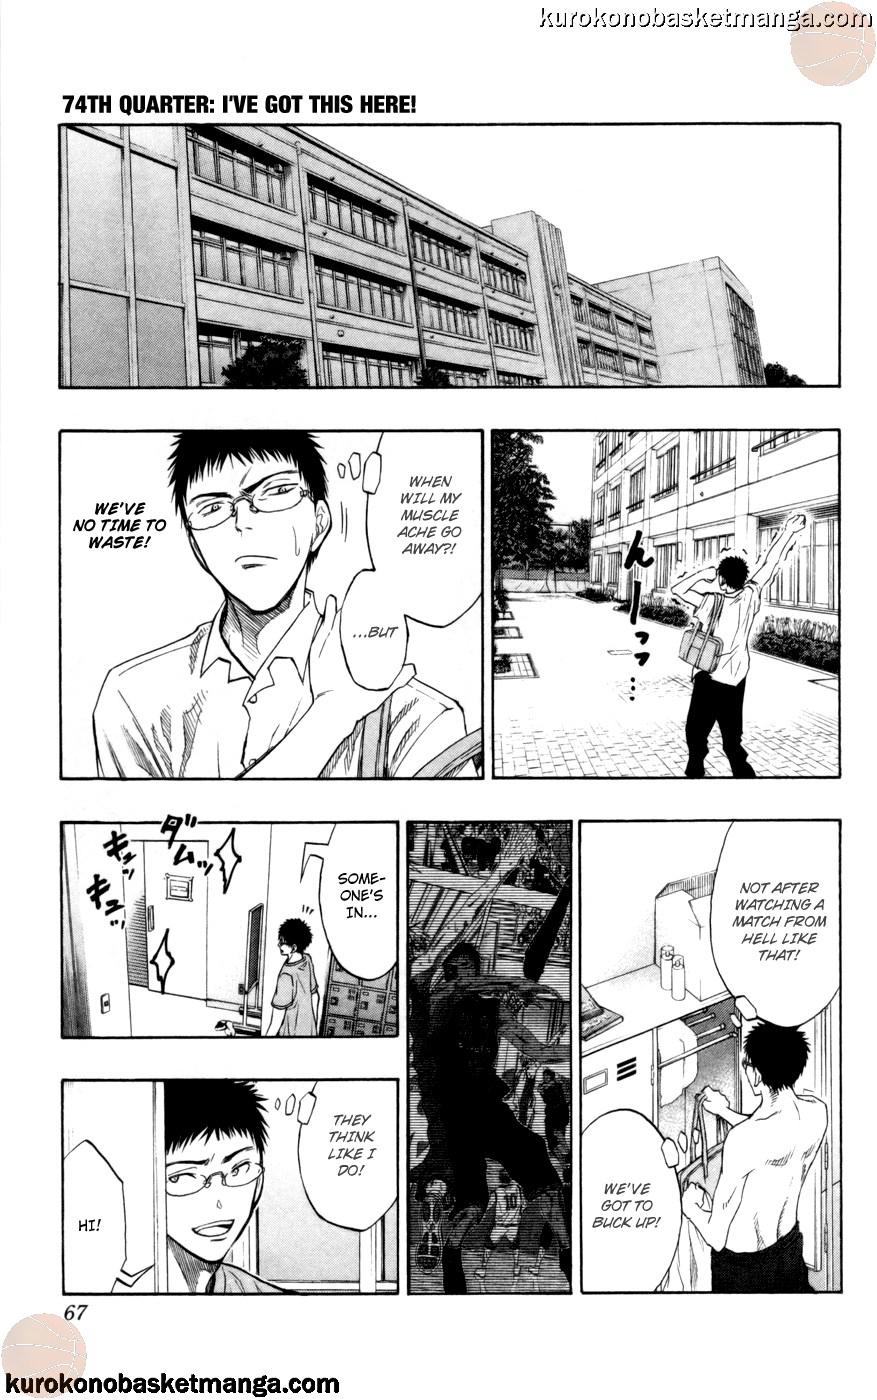 Kuroko no Basket Manga Chapter 74 - Image 01